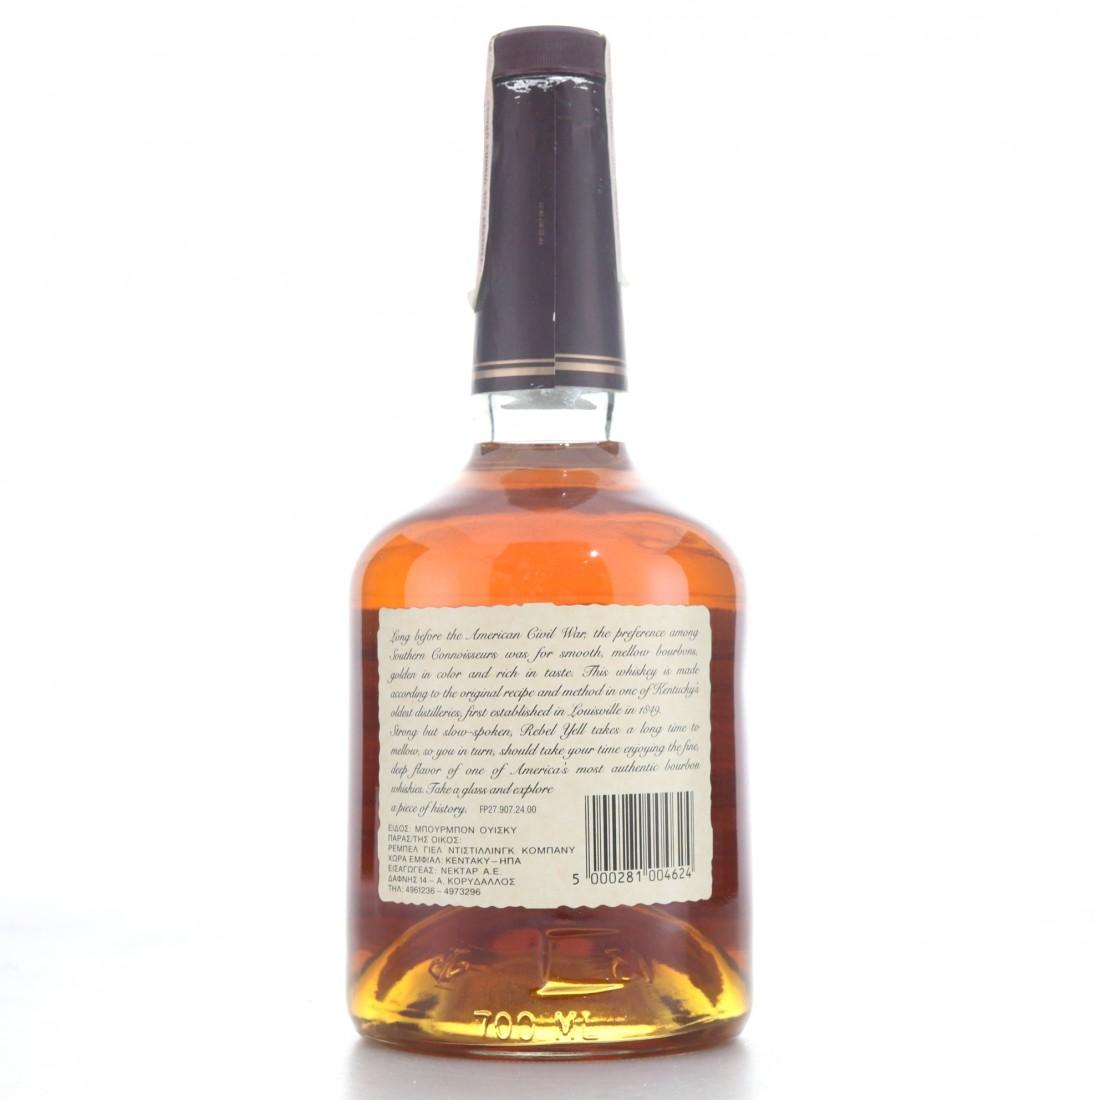 Rebel Yell Kentucky Straight Bourbon 1990s / Stitzel-Weller